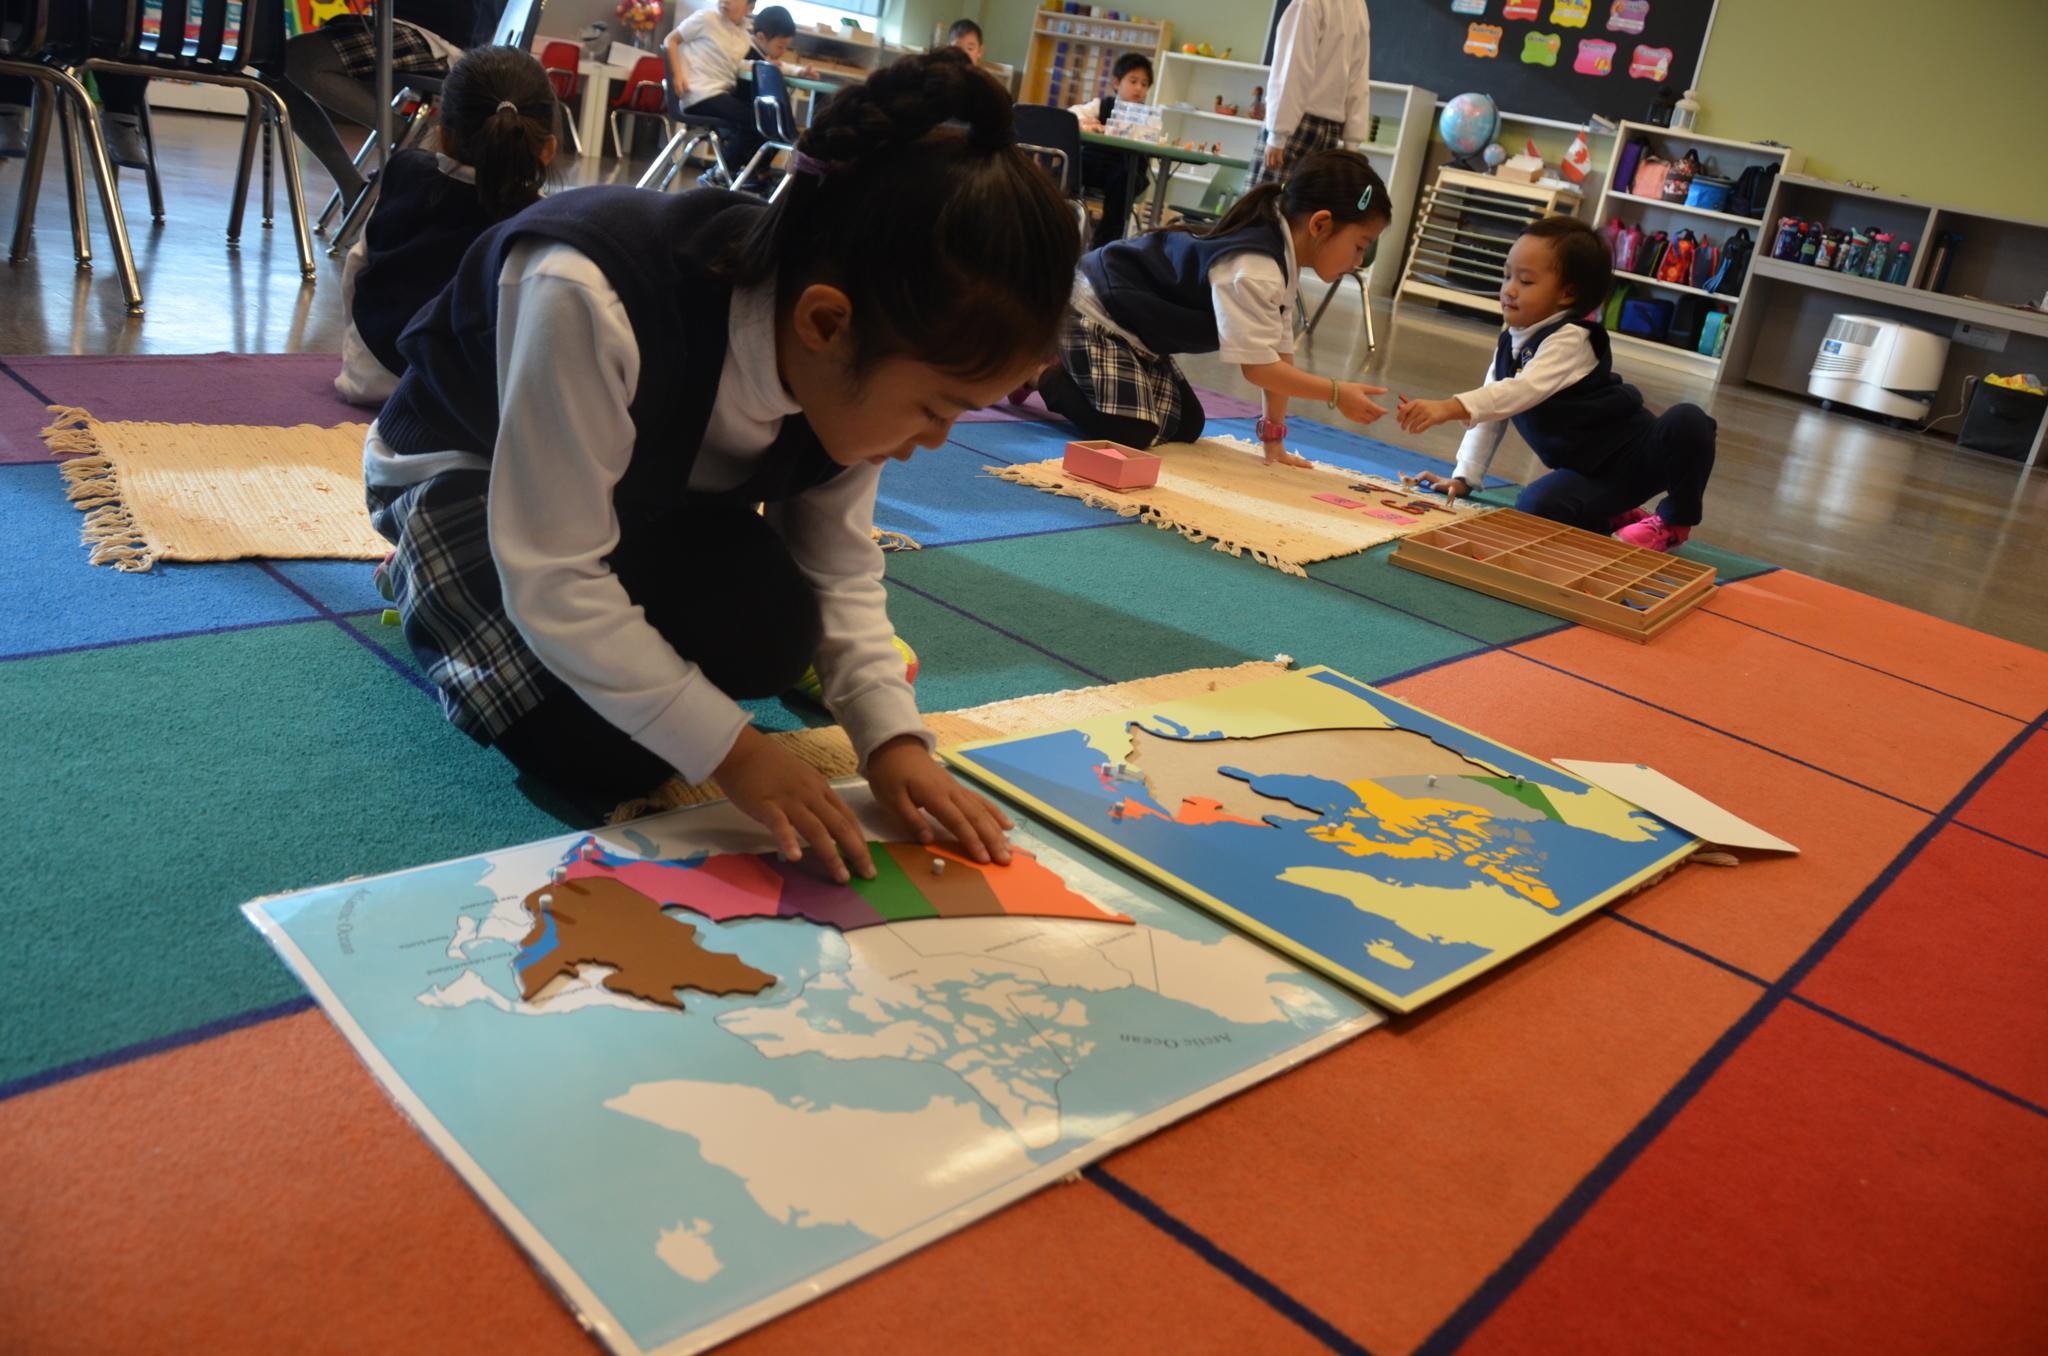 J Addison School in Markham: Montessori CASA programs suitable for ages 3 - 6 at J. Addison School.